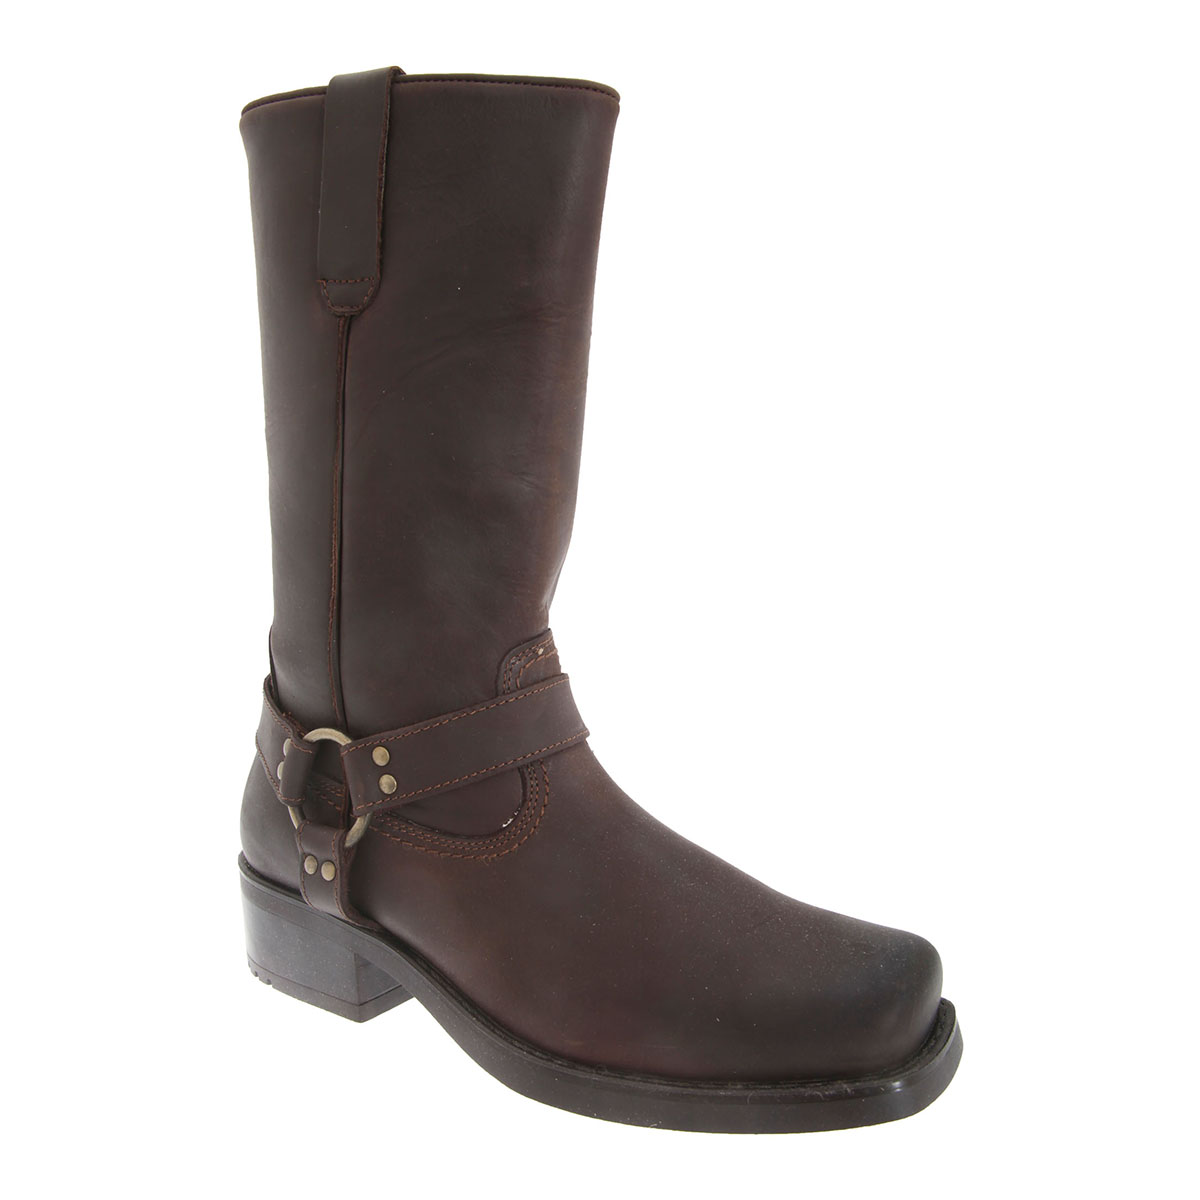 Dikamar Mens Administrator Gents Wellingtons//Wellies Rain Boots DF974